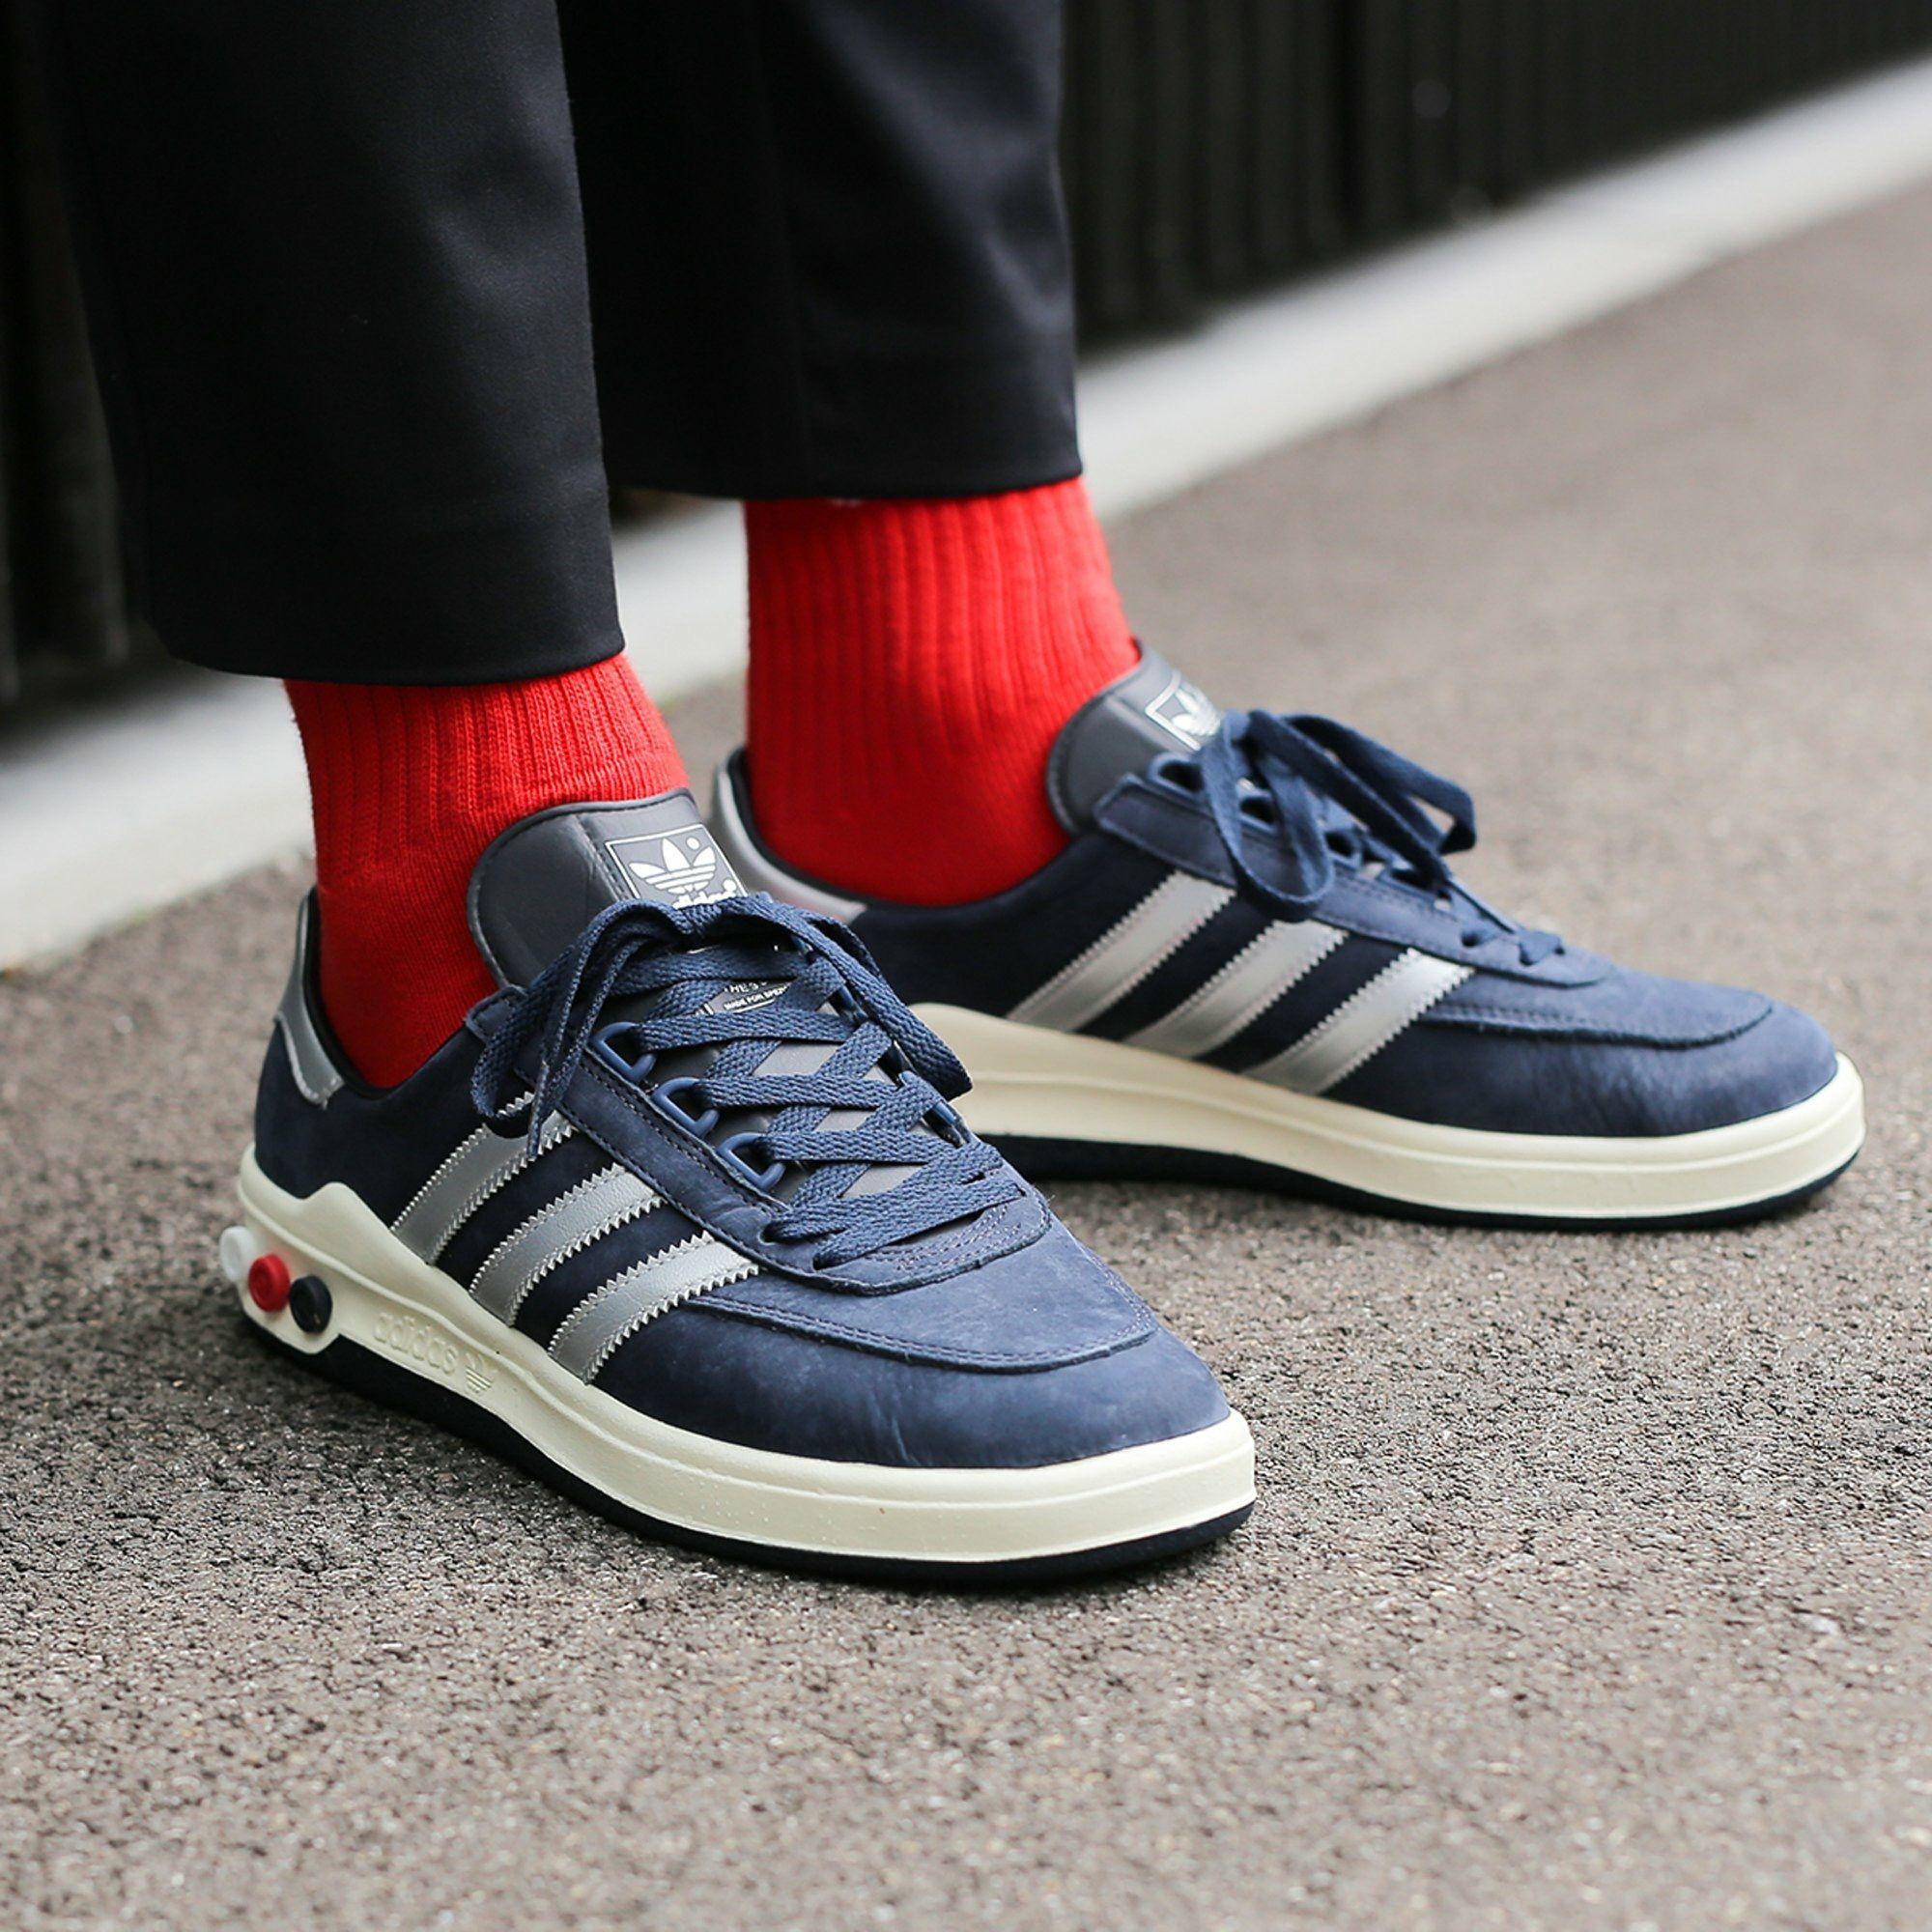 Adidas Originaux Adidas Chaussures De Sport Clmba Spzl - Bleu bNU33lt2